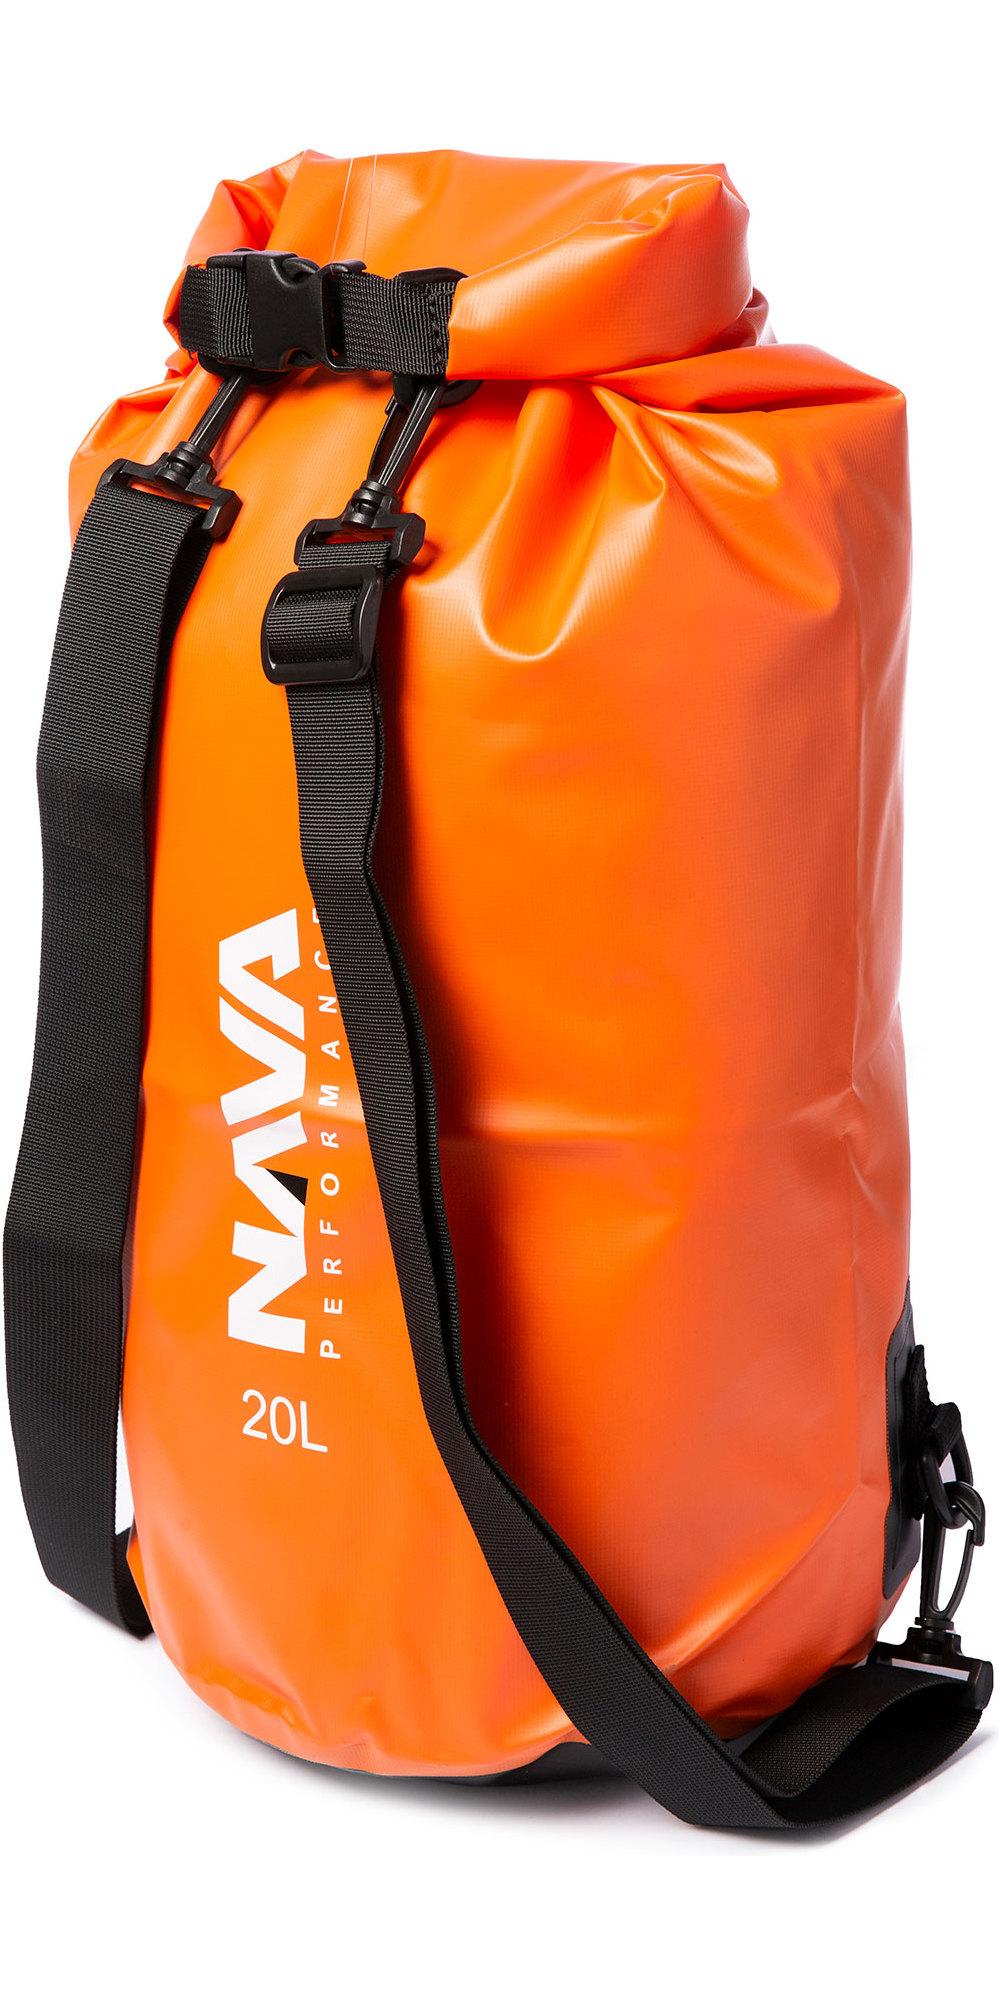 2020 Nava Performance 20L Drybag With Backpack Straps NAVA003 - Orange